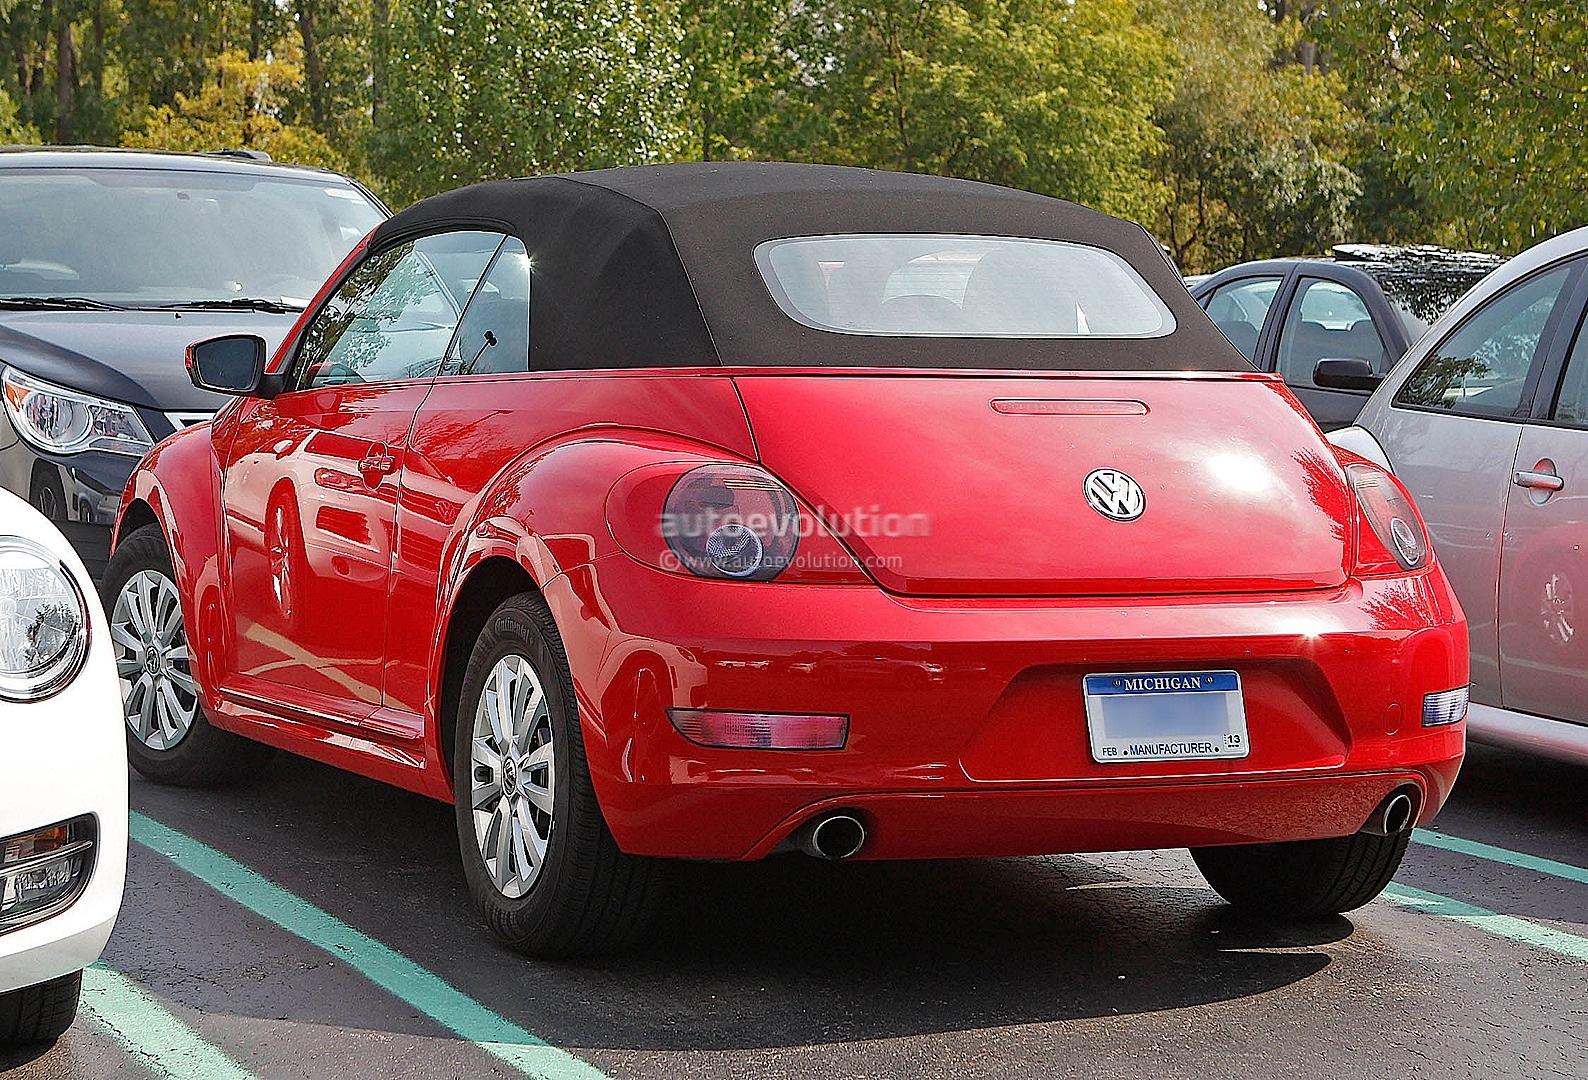 spyshots all new 2014 vw beetle cabriolet autoevolution. Black Bedroom Furniture Sets. Home Design Ideas